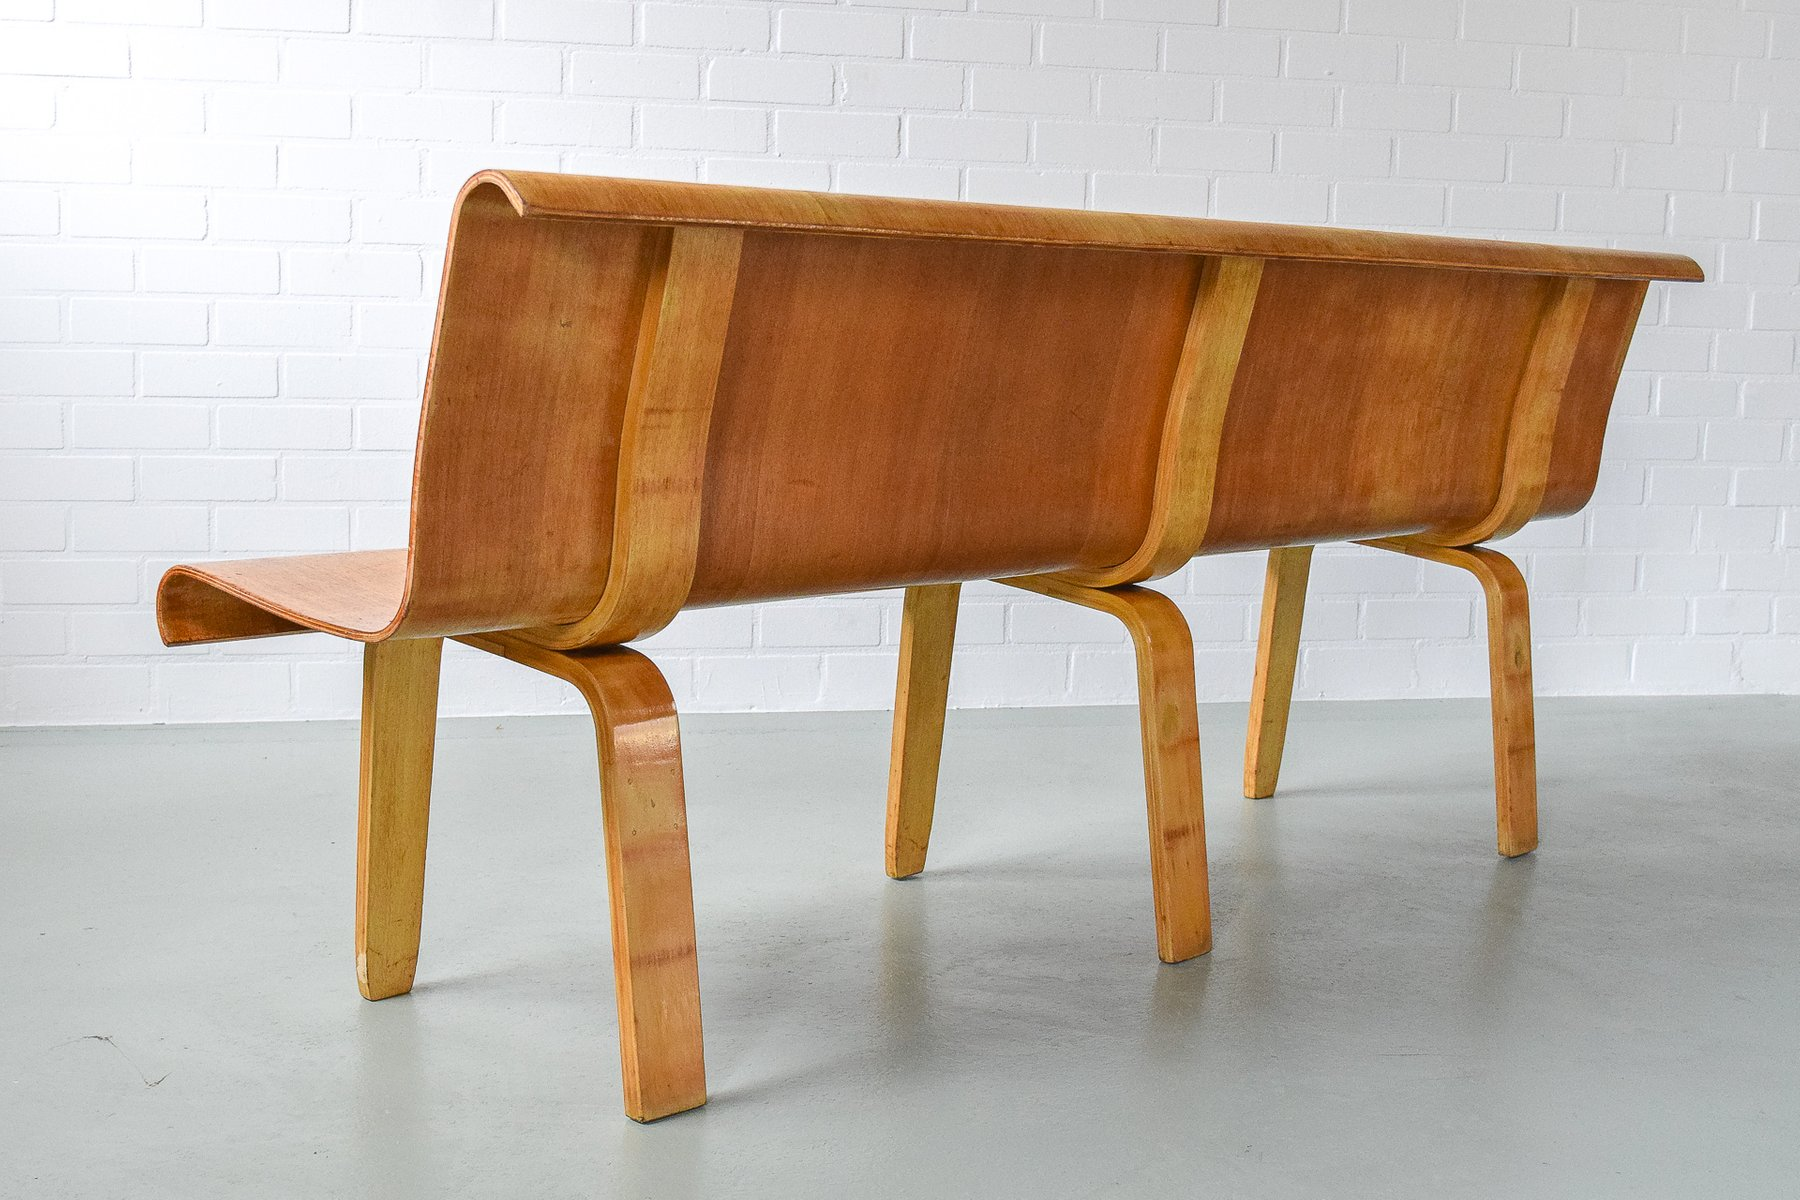 Plywood Bench 1950s bei Pamono kaufen